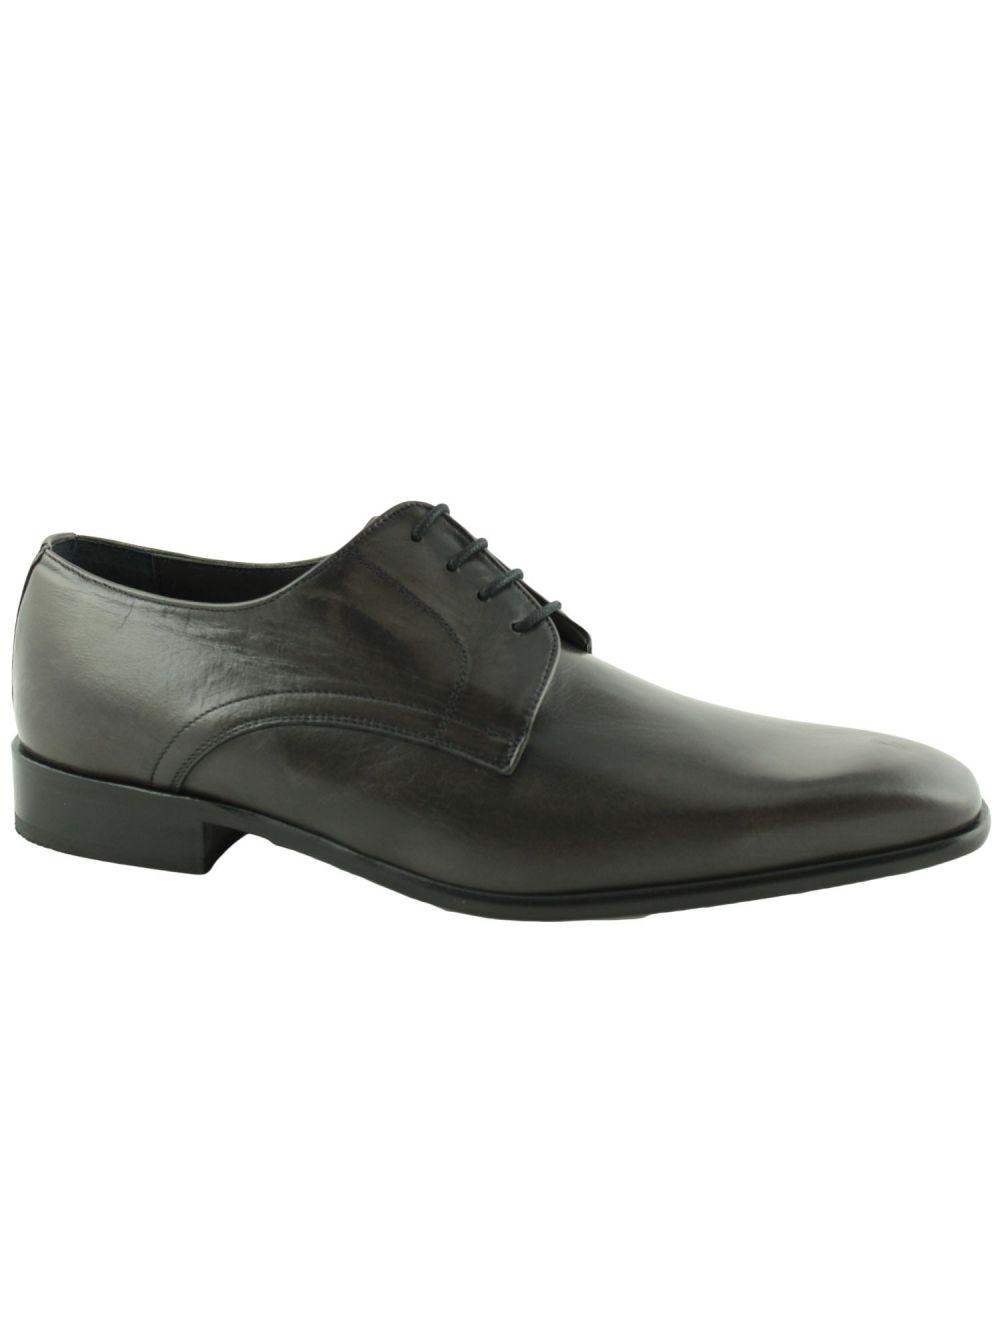 Chaussure Pierre Cardin en cuir Ref: Jetko